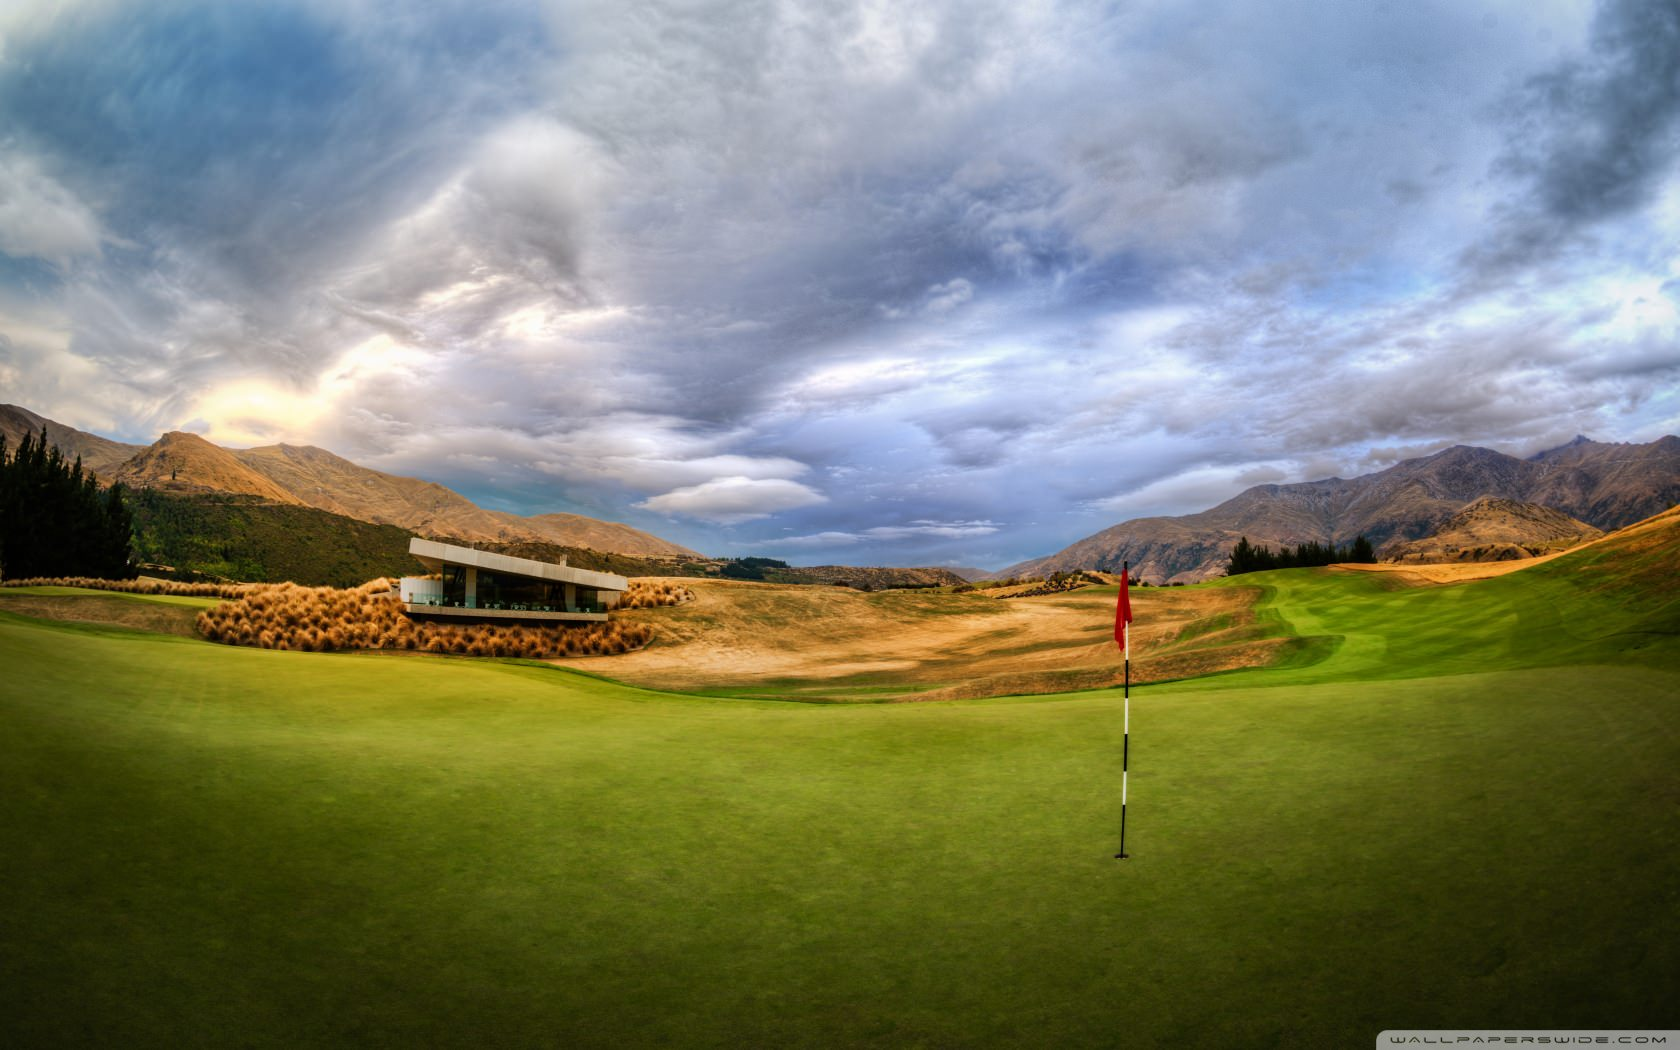 beautiful_golf_course_2-wallpaper-1680x1050